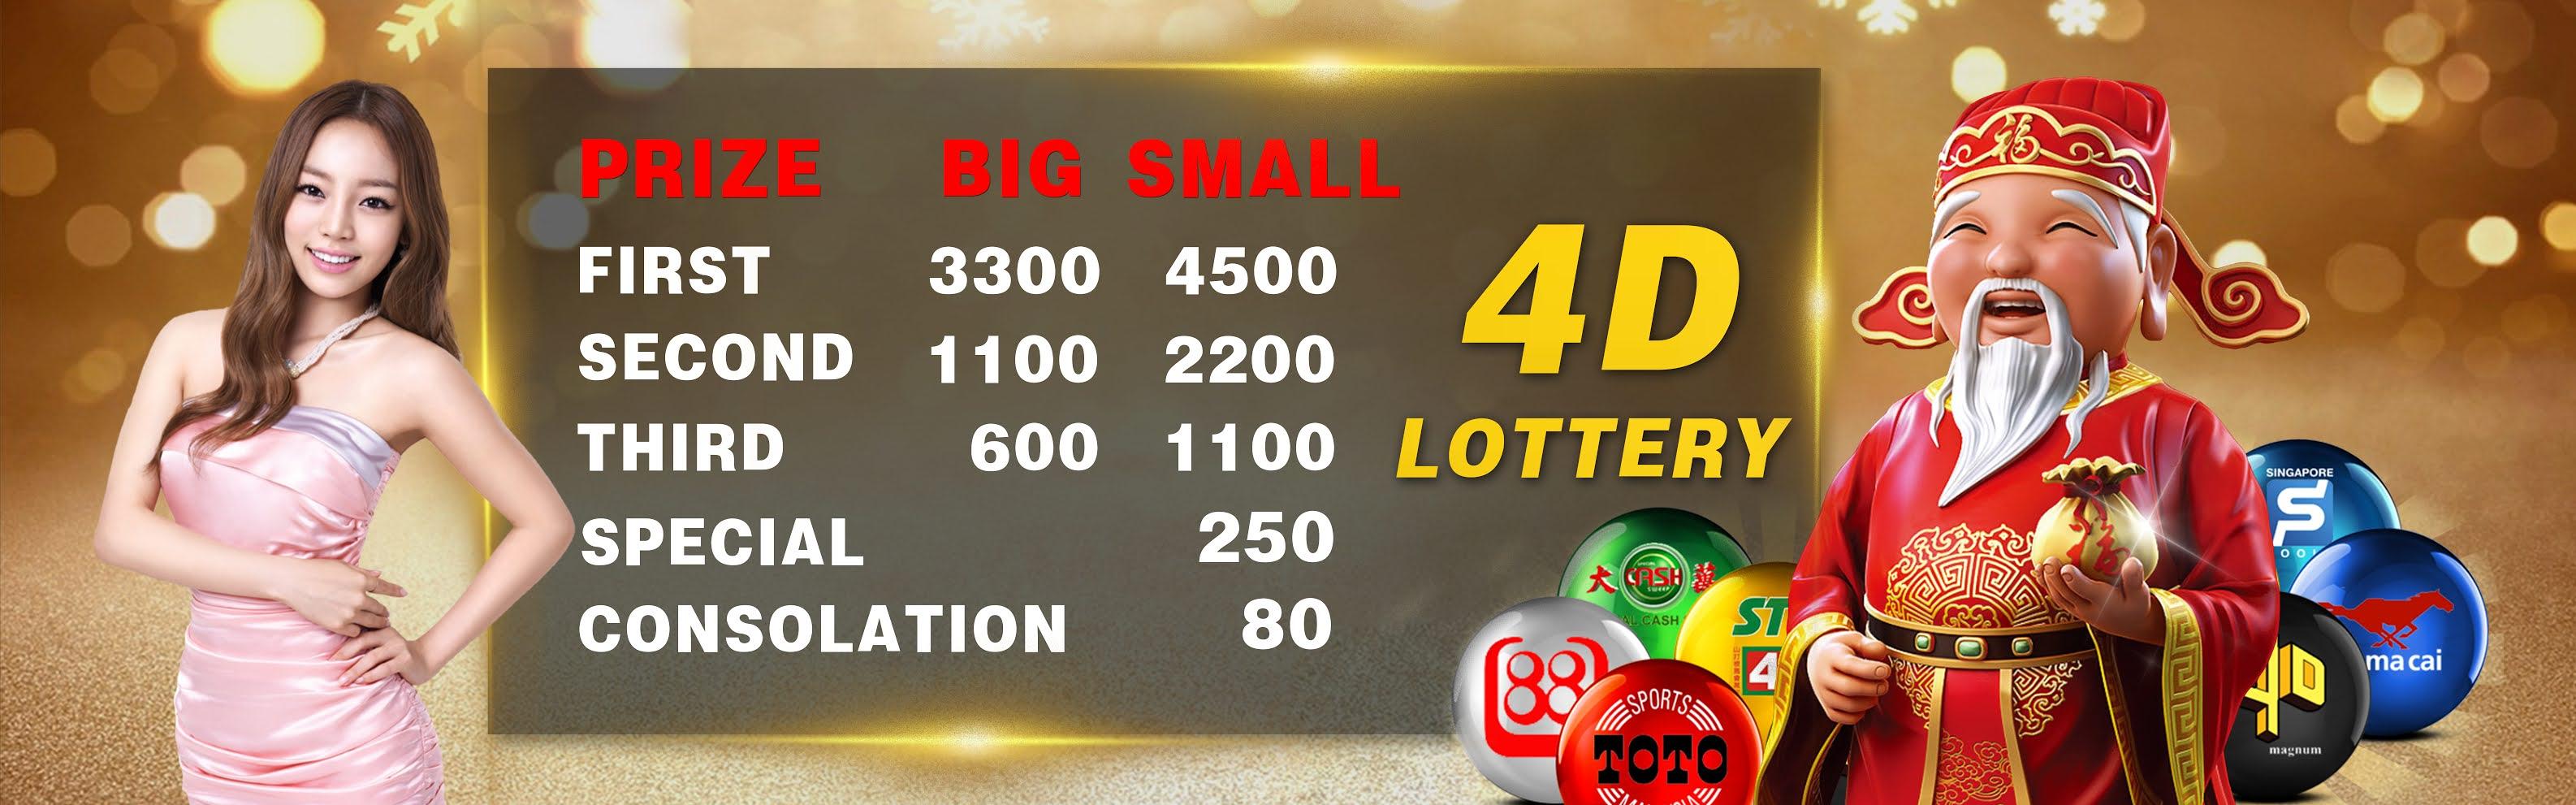 Kingclub88 Online Football Betting Sports Live Casino Malaysia